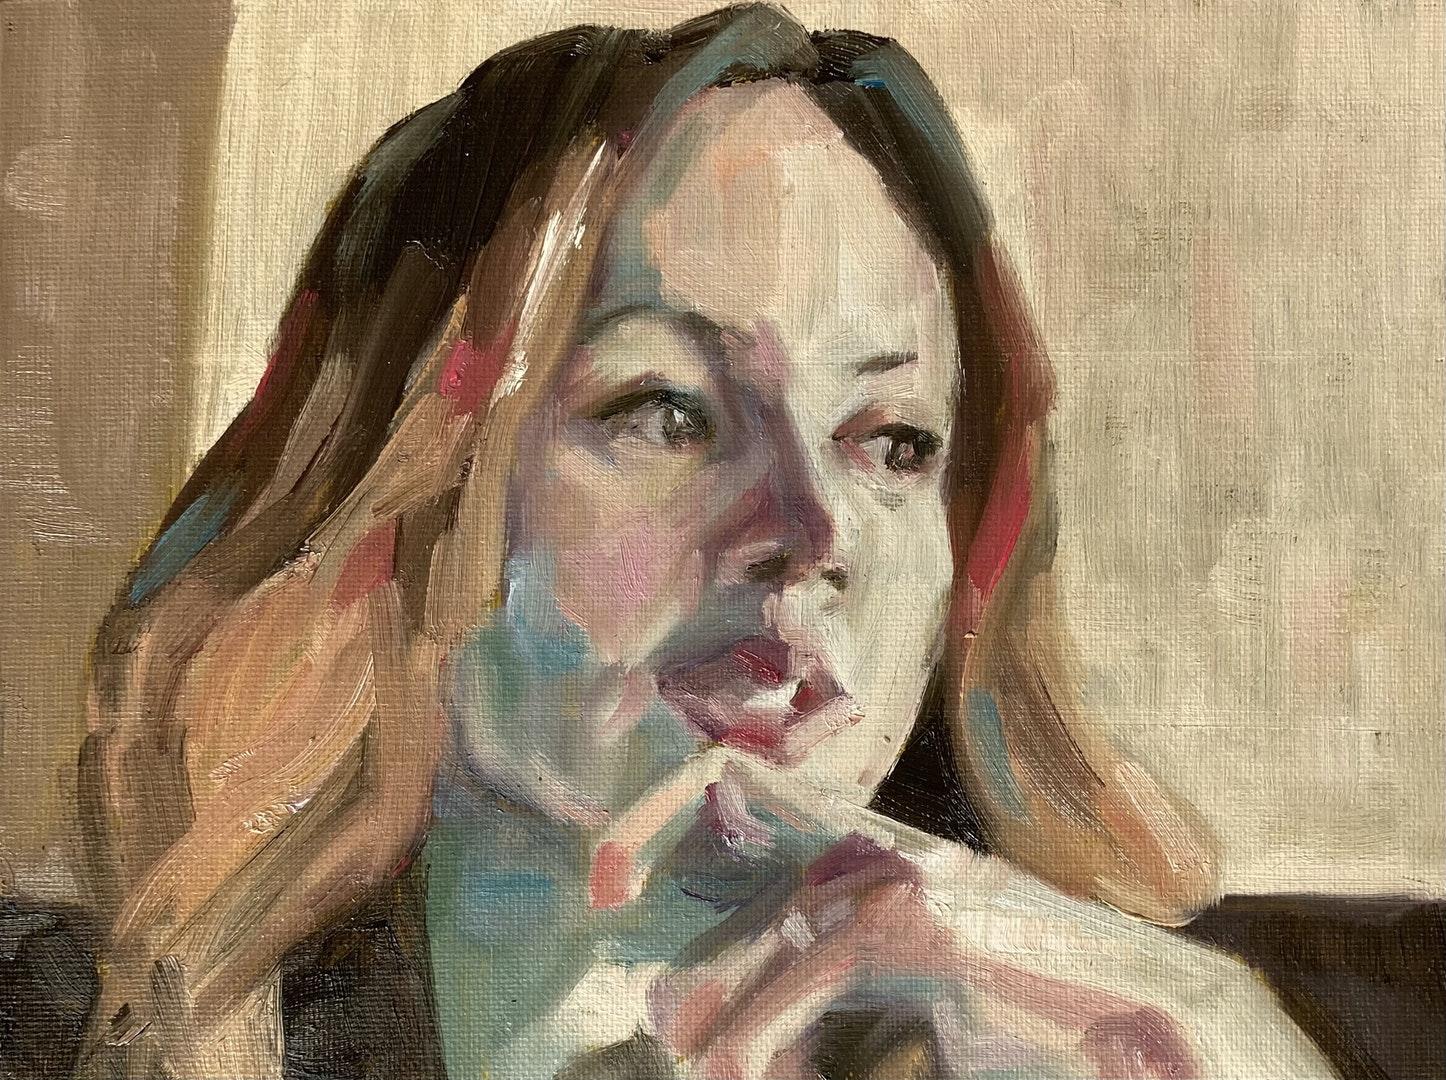 'Sara by Zoomlight', Varosha Cornford, Oil on canvas board, 18 x 24 cm